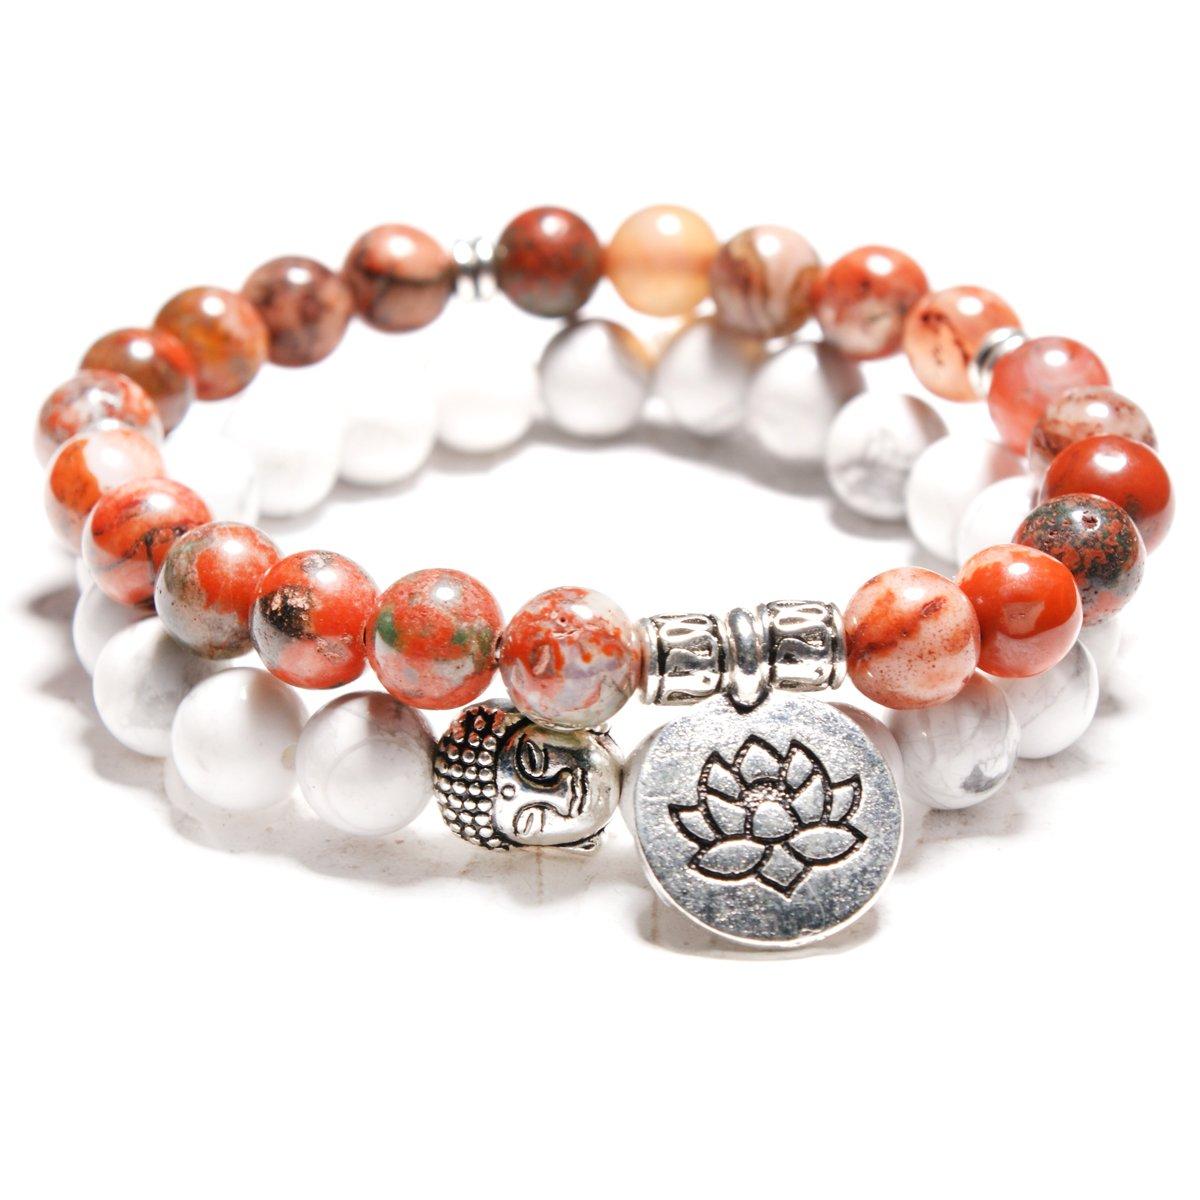 Moon Girl 8MM Lotus Buddhist Mala Stone Bracelets Femme Yoga Meditation Wrist Charm Bracelets Women 18ky0105